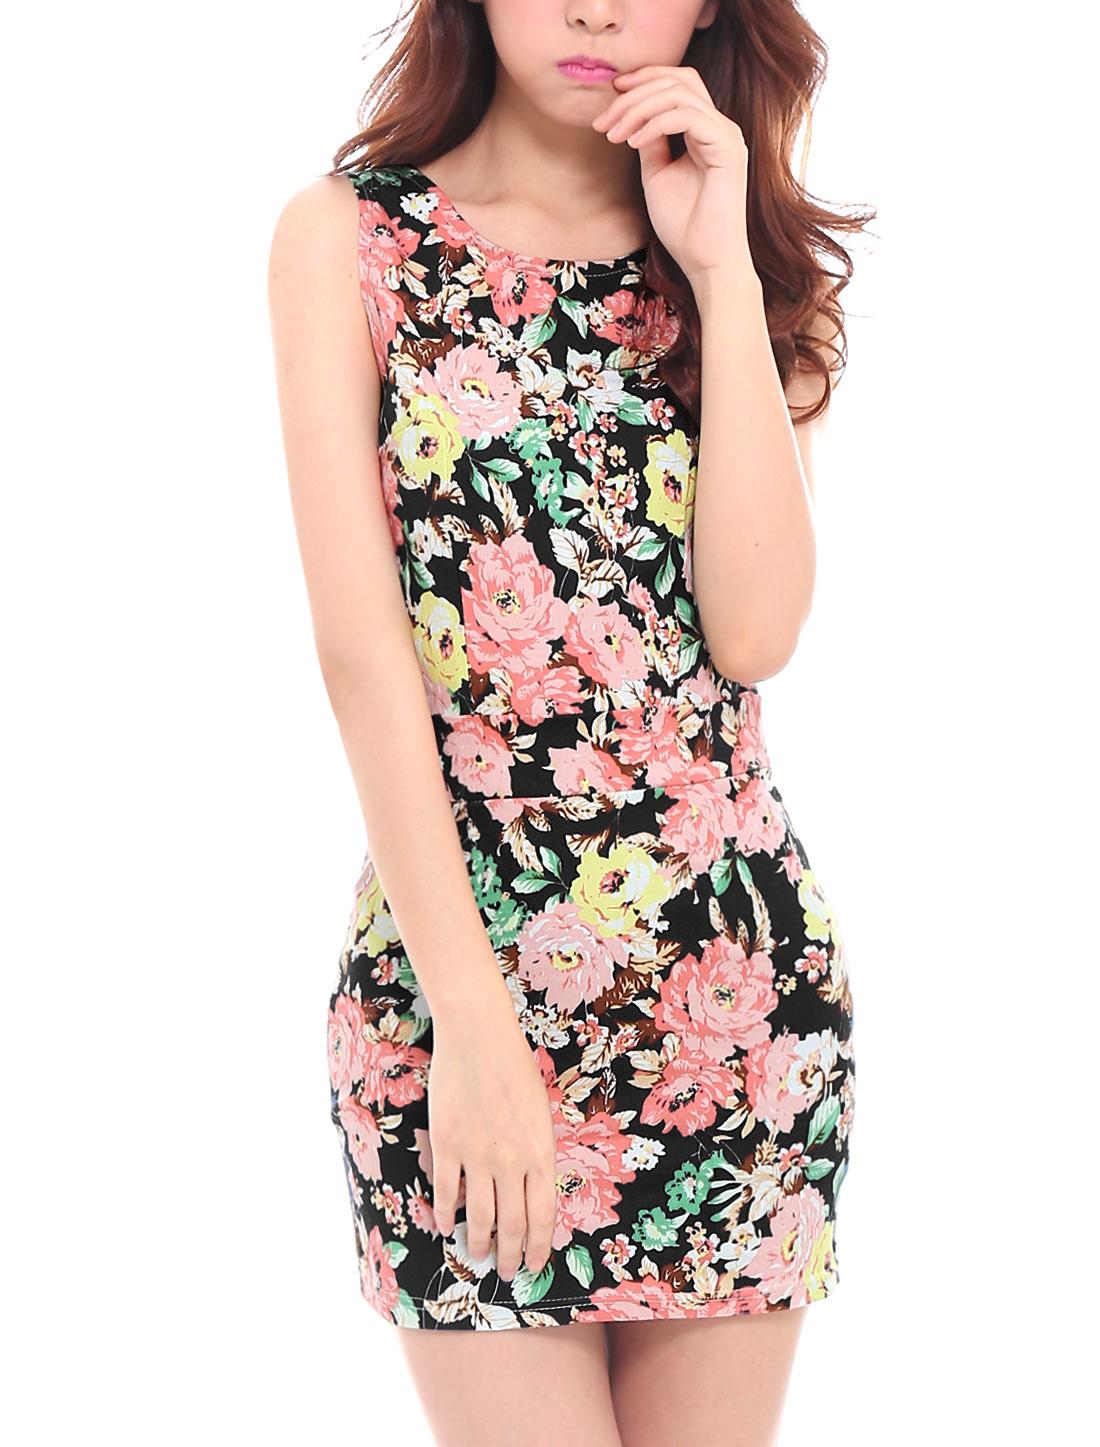 Lady's Hidden Side Zipper Cut Out Back Floral Print Bodycon Dress Black XS